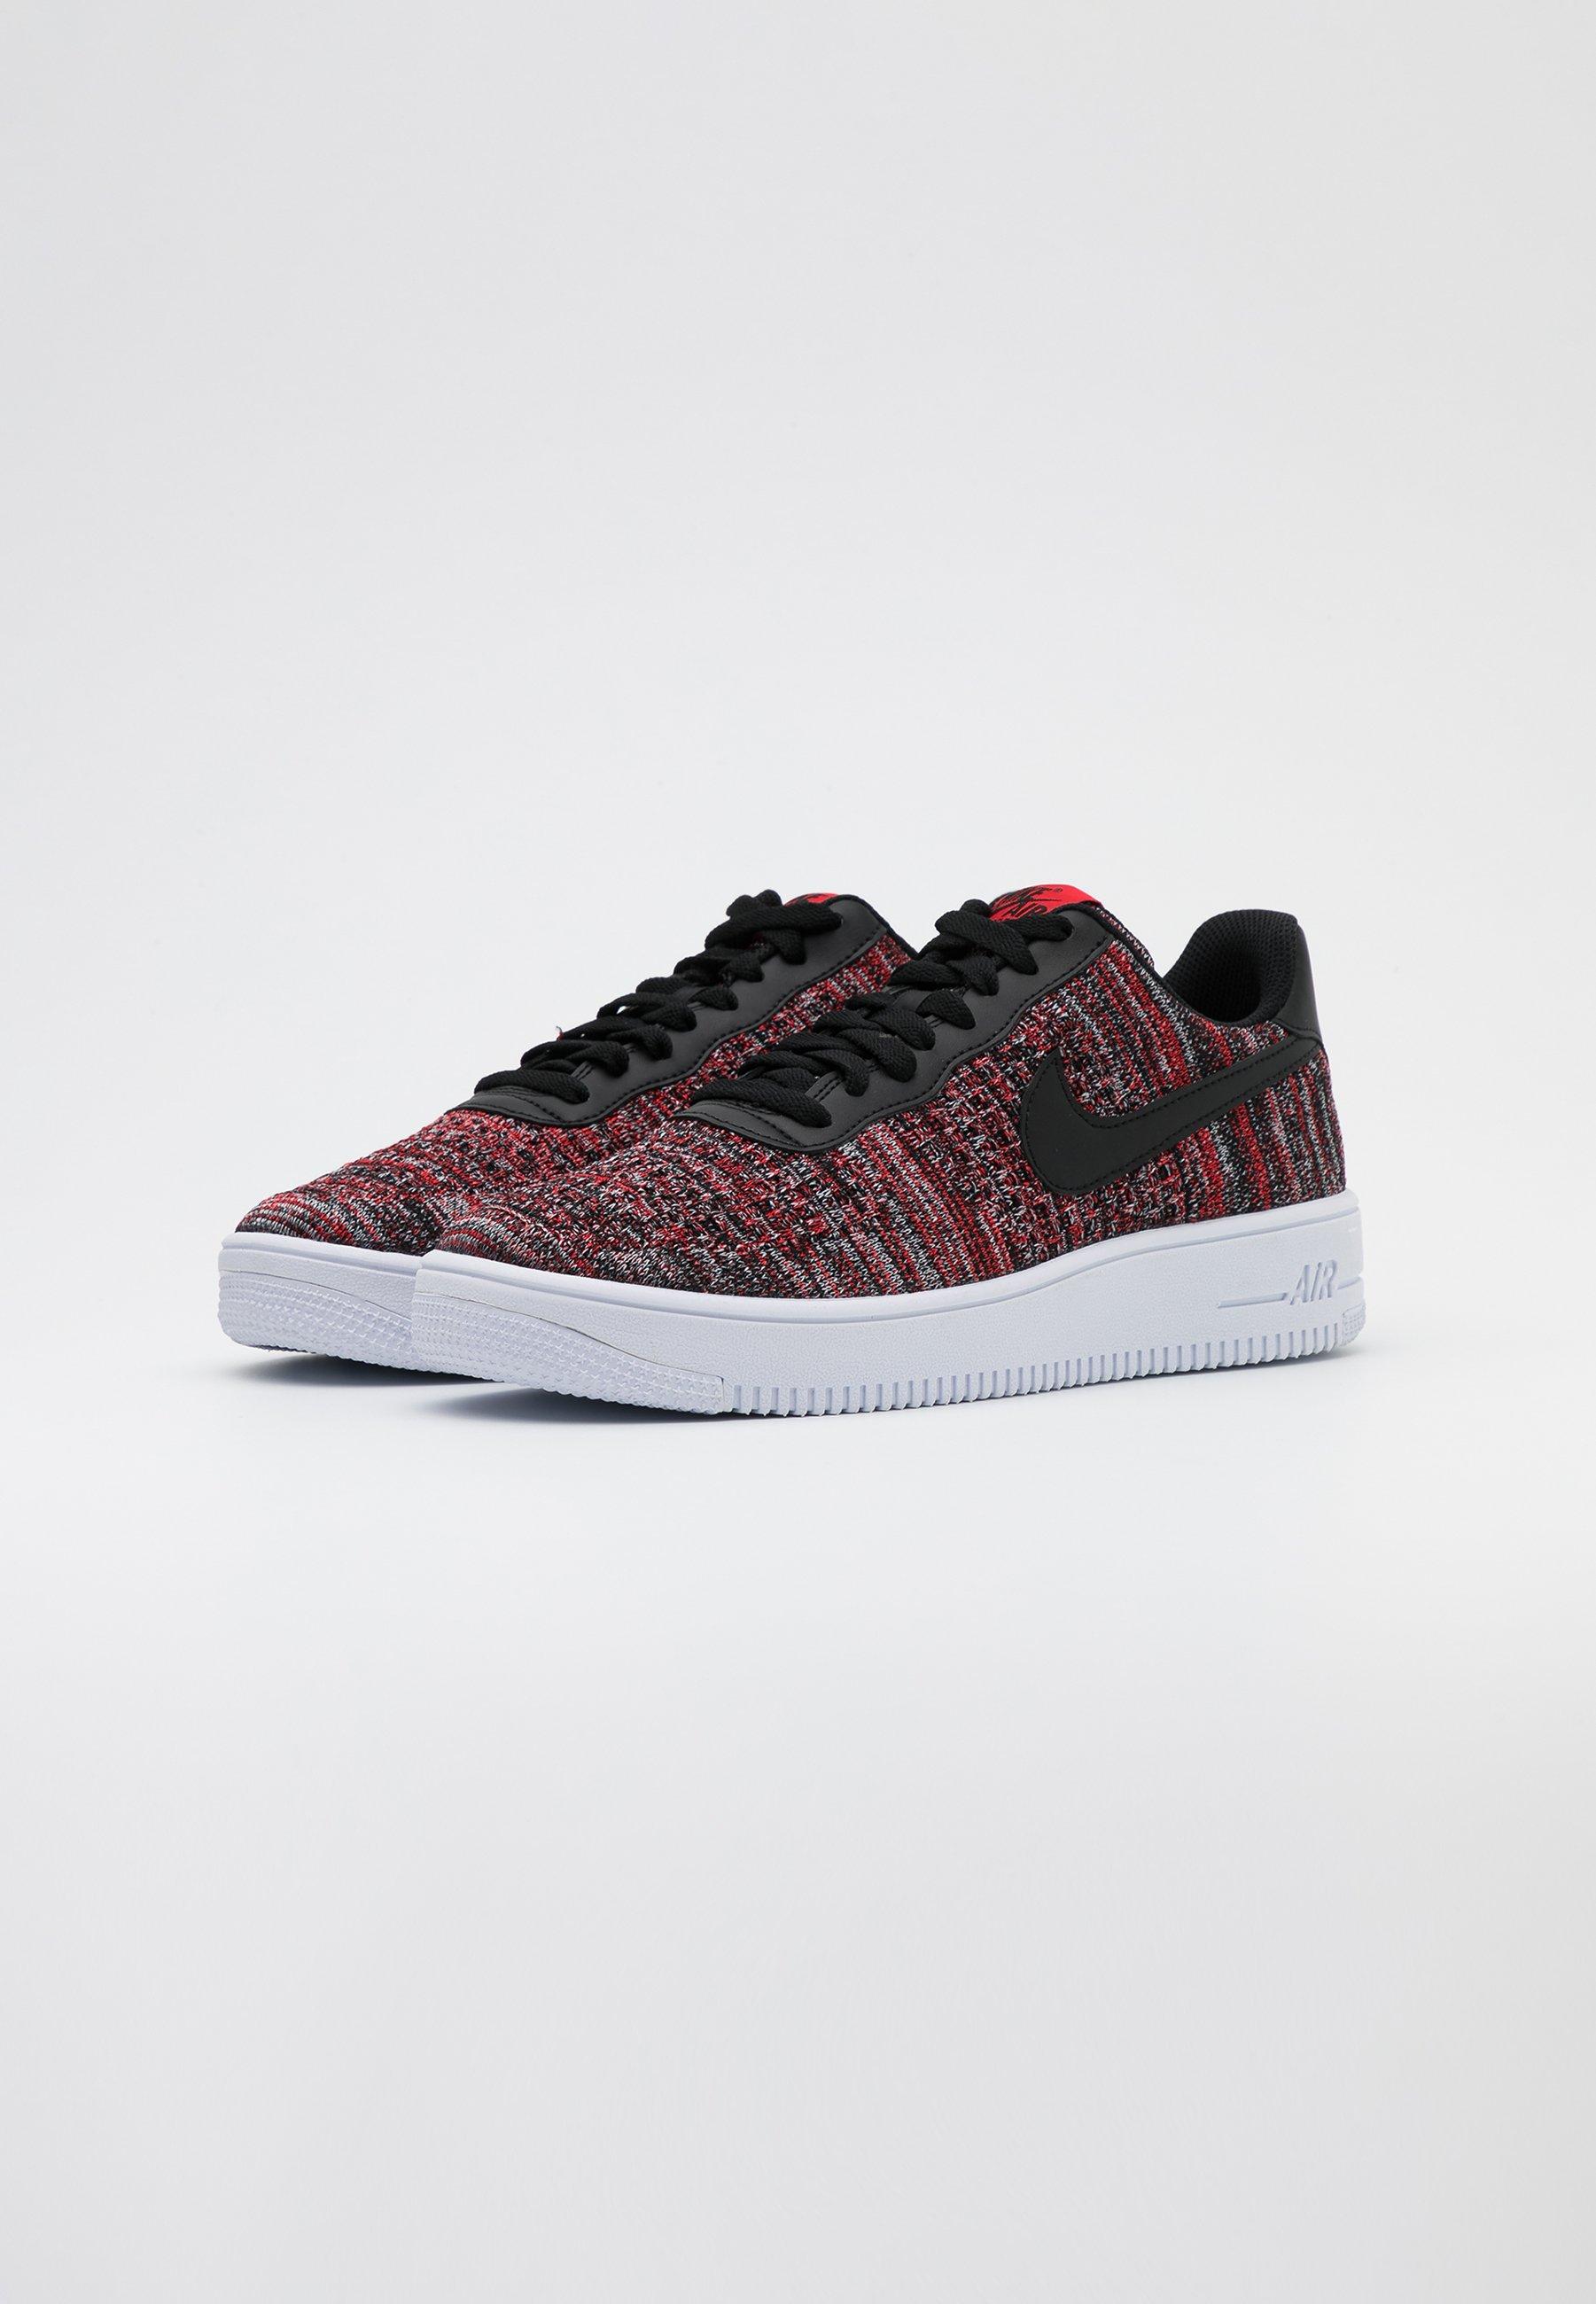 AIR FORCE FLYKNIT Sneakers university redblackwolf greywhite